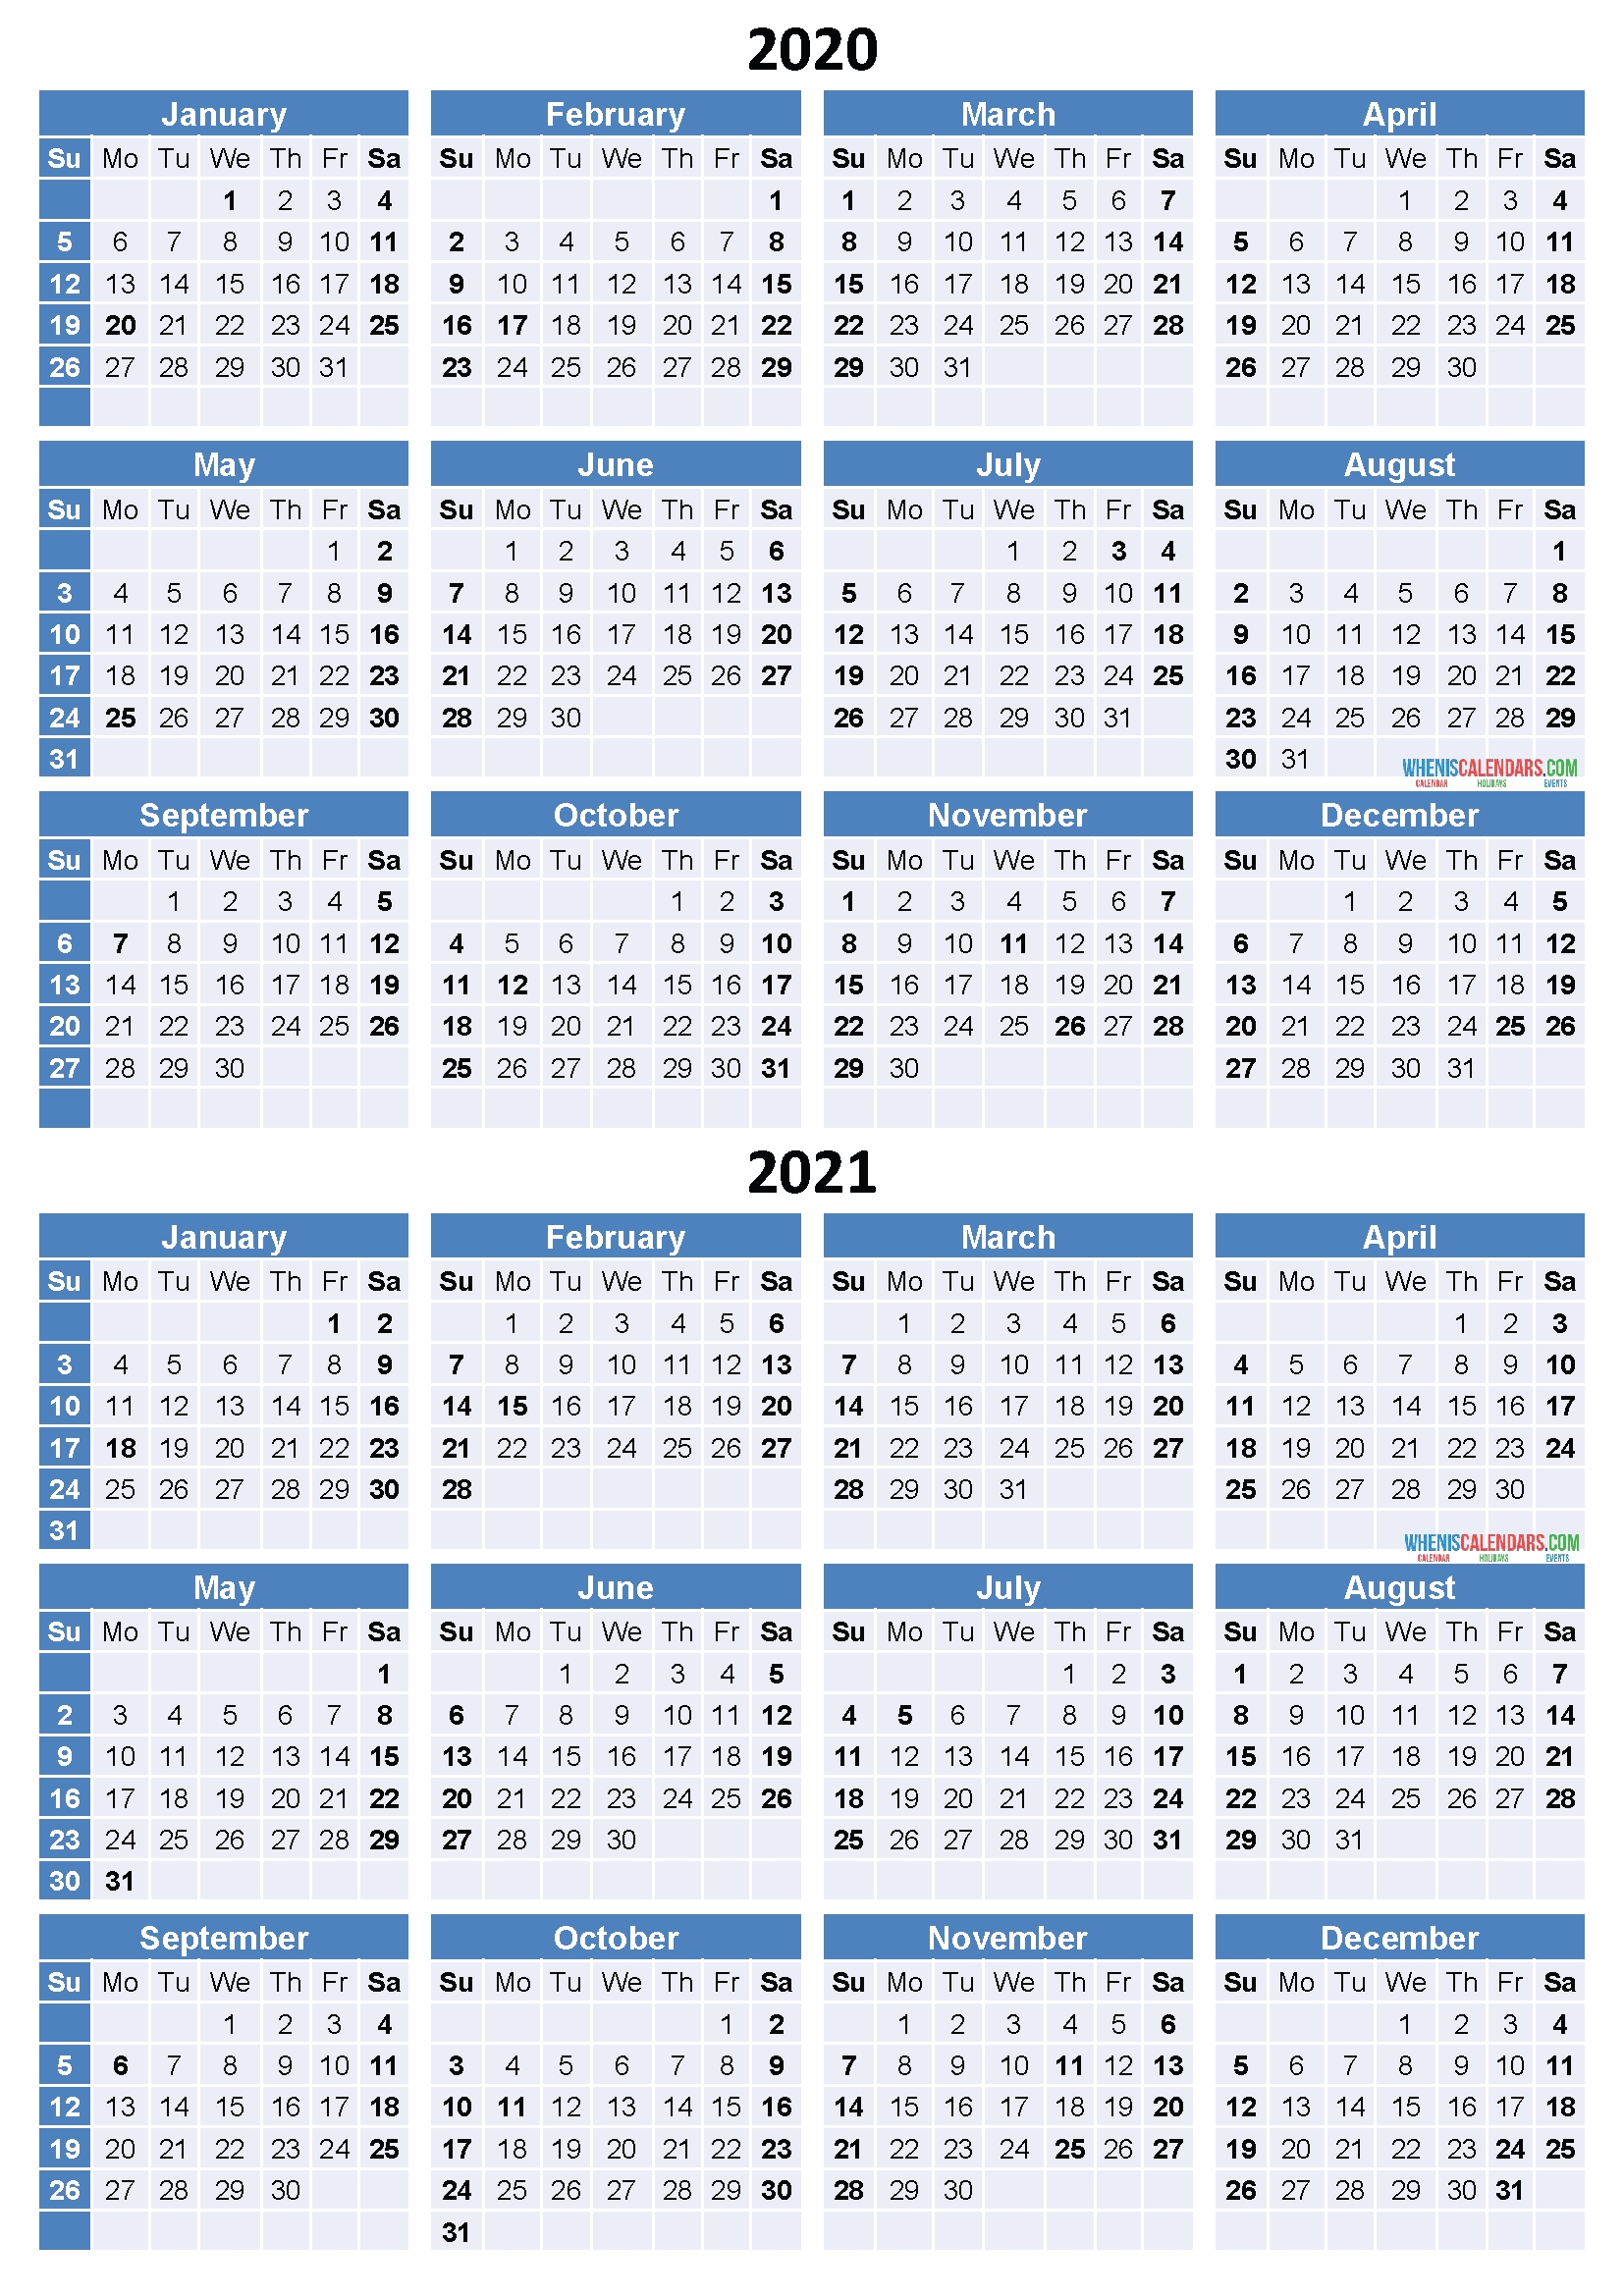 2020 And 2021 Calendar Printable Free Download Word, Pdf, Image – Free Printable 2020 Monthly-Print Free 2021 Calendar Without Downloading